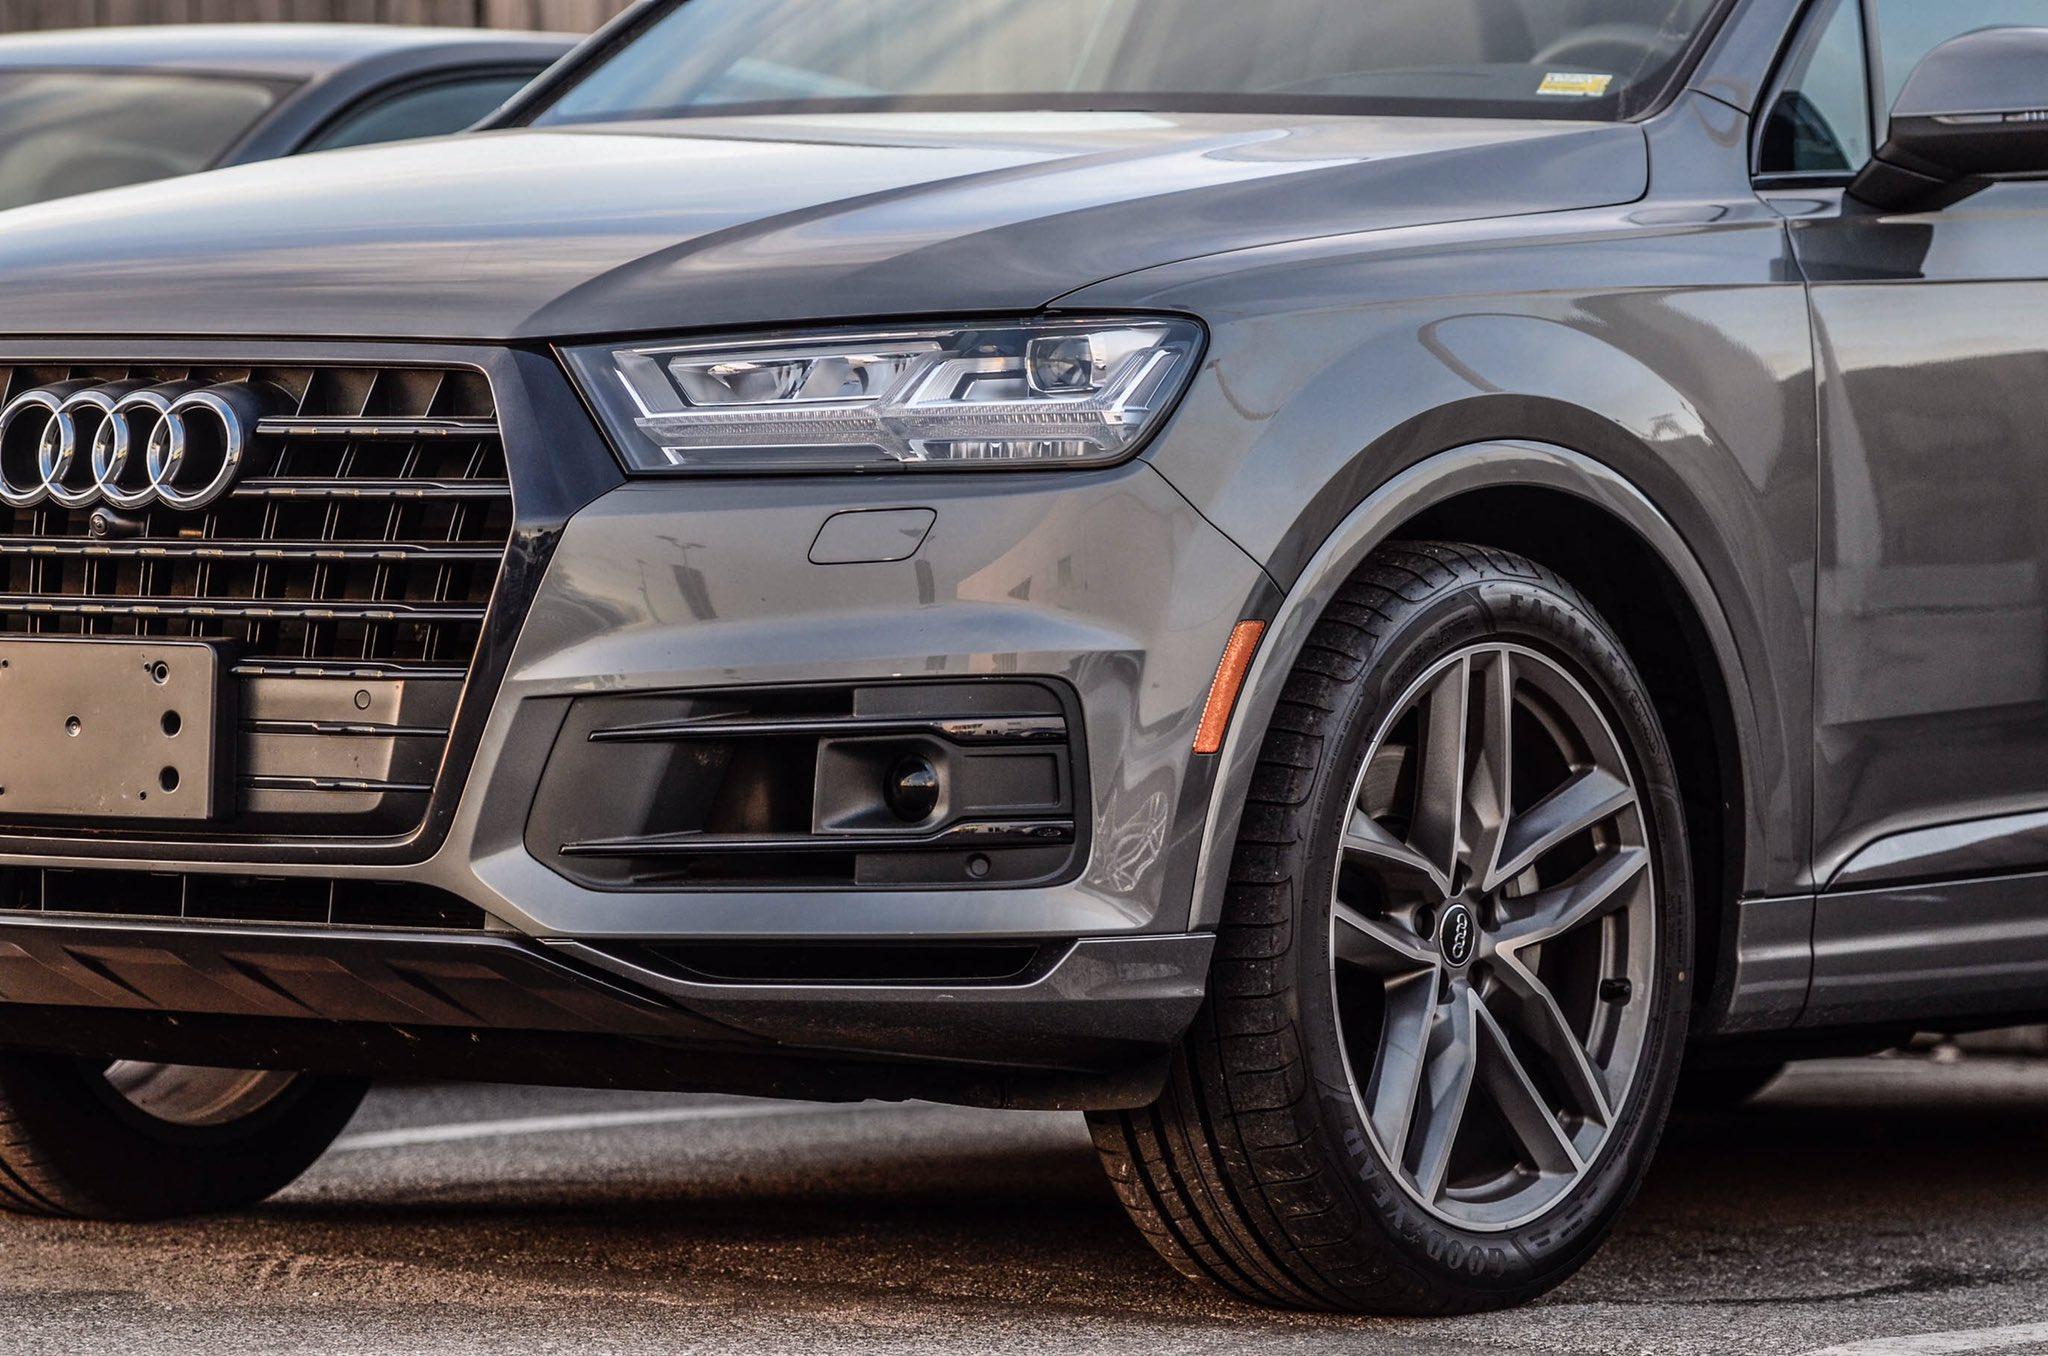 Kansas City Audi On Twitter Quot Samurai Grey Q7 Audi Sport